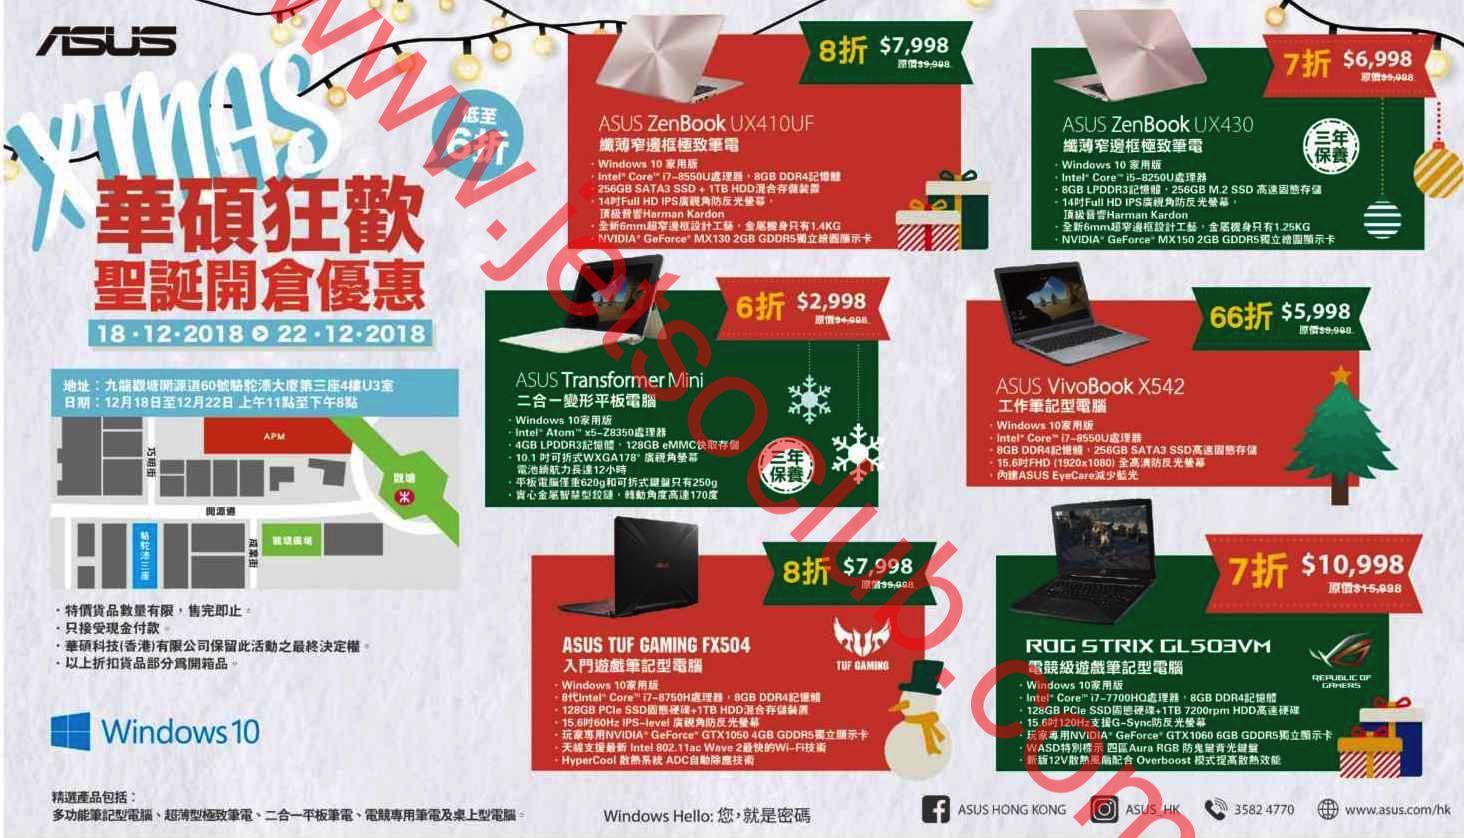 ASUS 華碩:聖誕開倉(18-22/12) ( Jetso Club 著數俱樂部 )